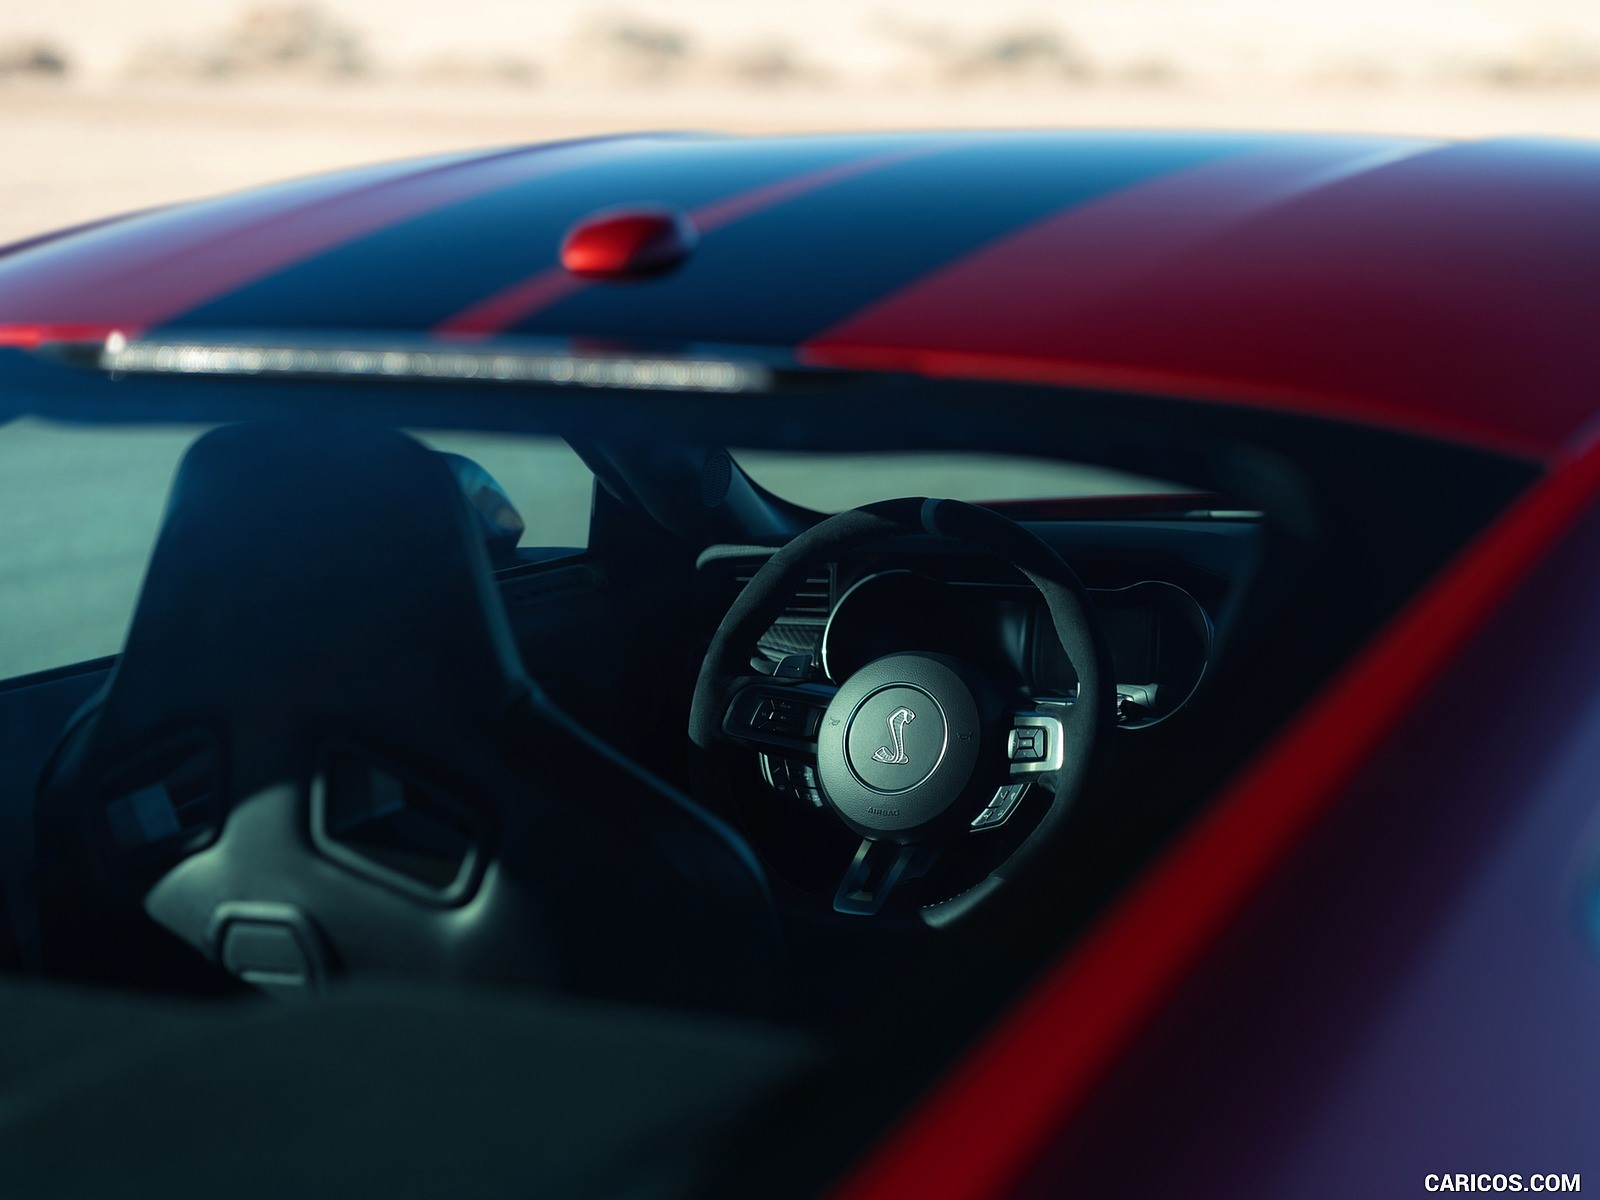 Ford Mustang Shelby 12k duvar kağıtları